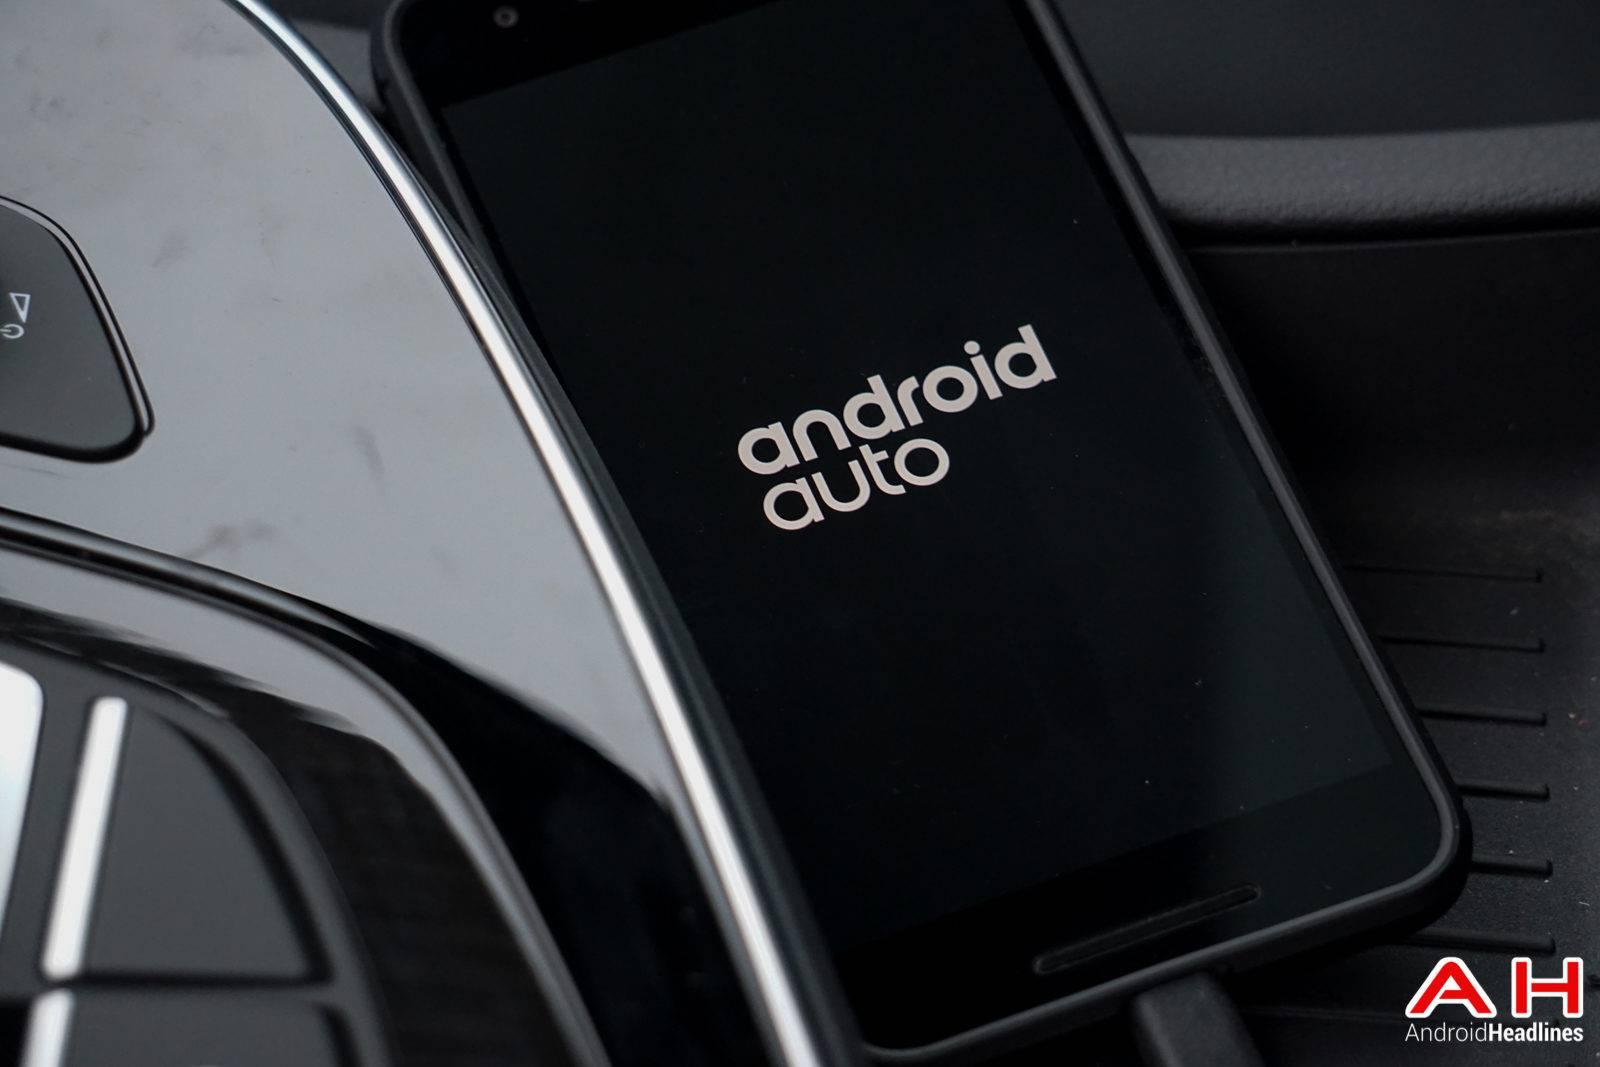 Audi-Q7-Review-AH-00069